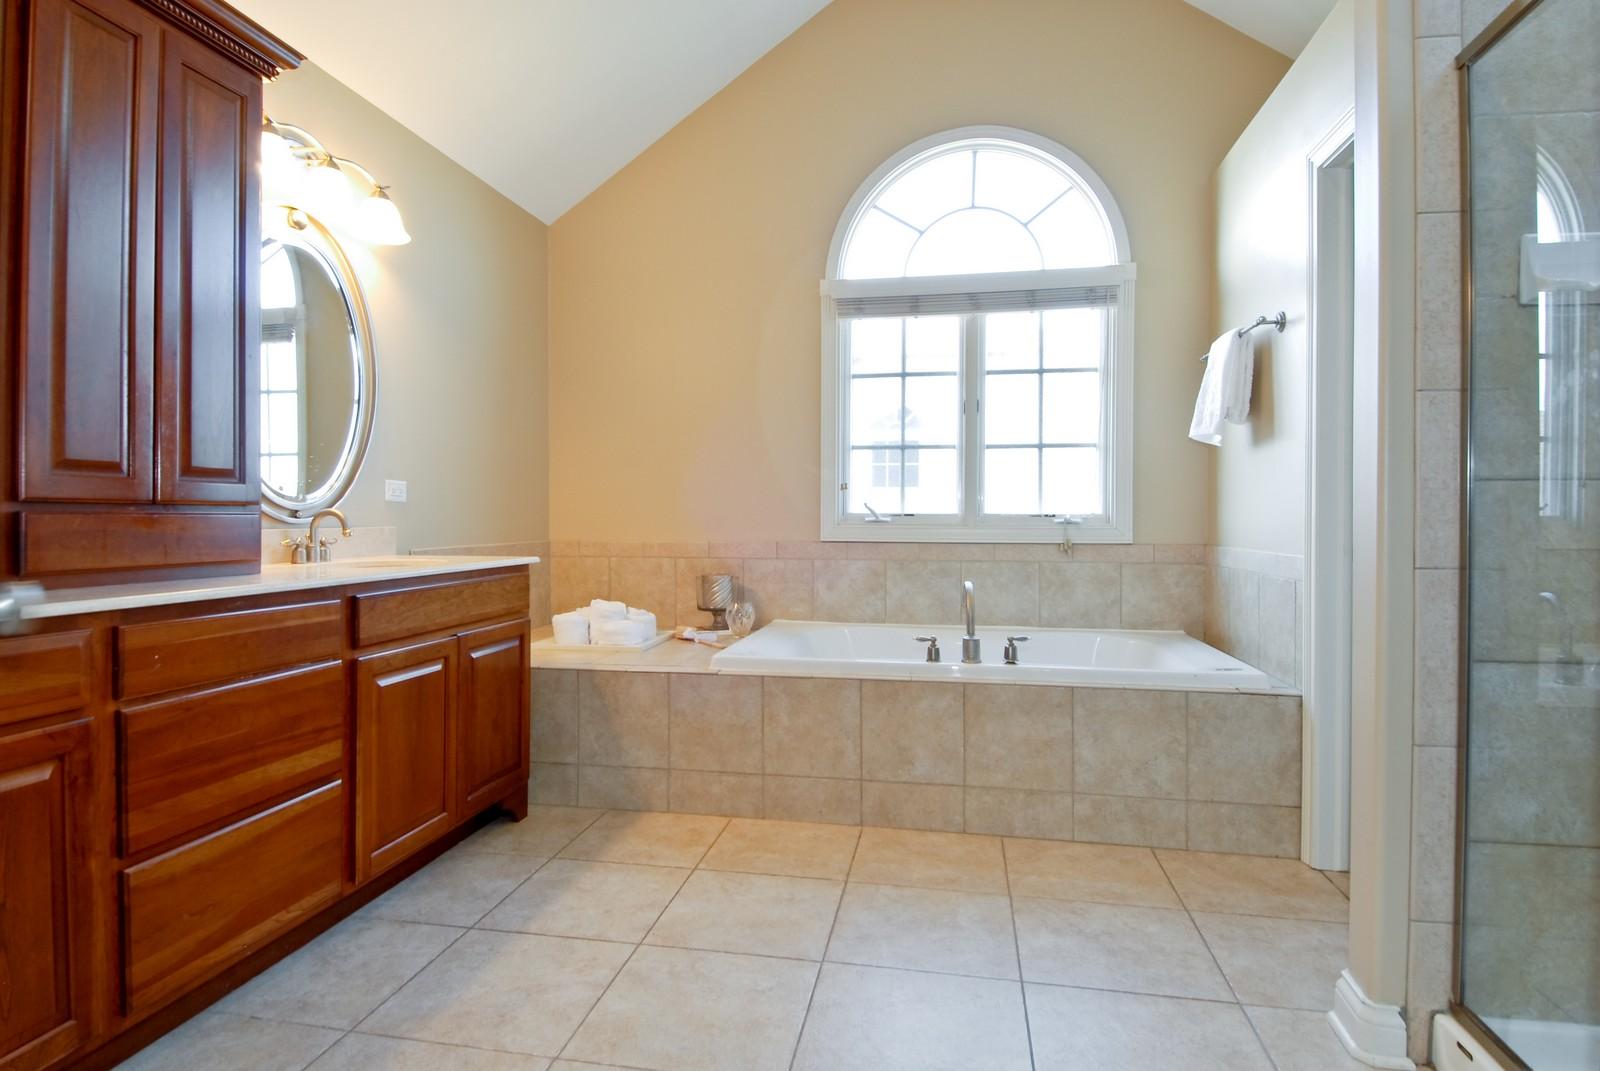 Real Estate Photography - 3839 Junebreeze Ln, Naperville, IL, 60564 - Master Bathroom